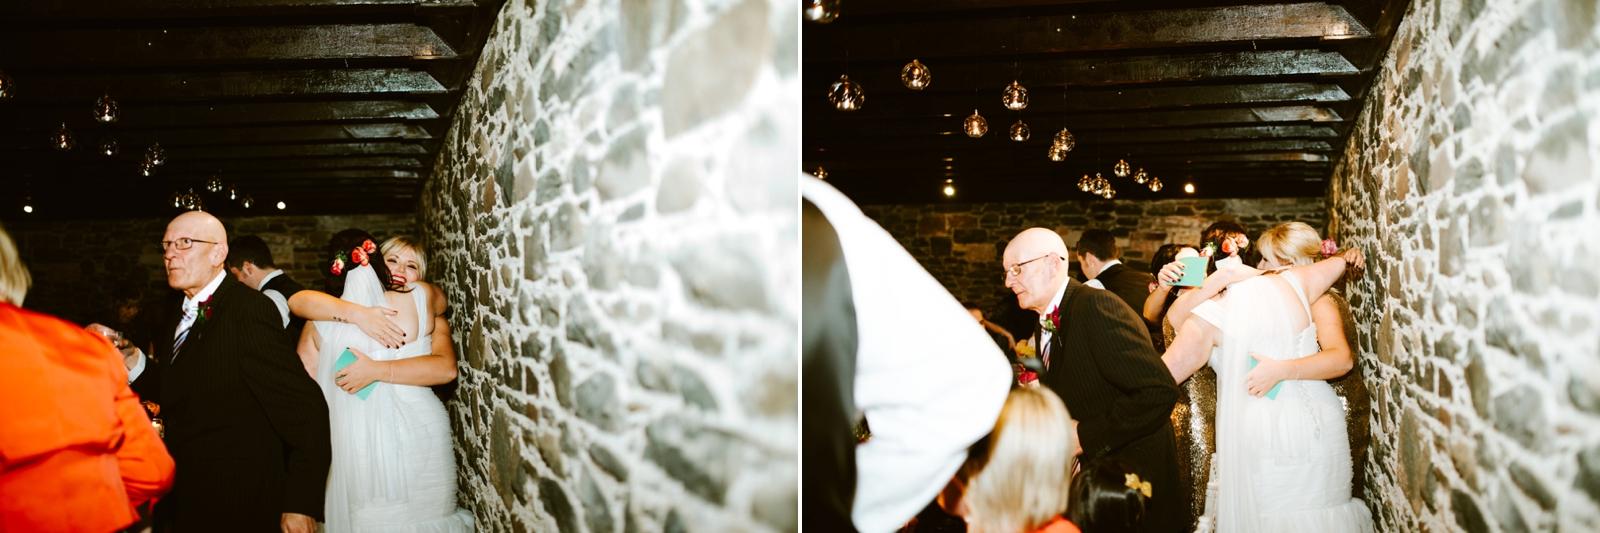 alternative-wedding-photography-scotland-katie-stephen-aikwood-tower-445.jpg